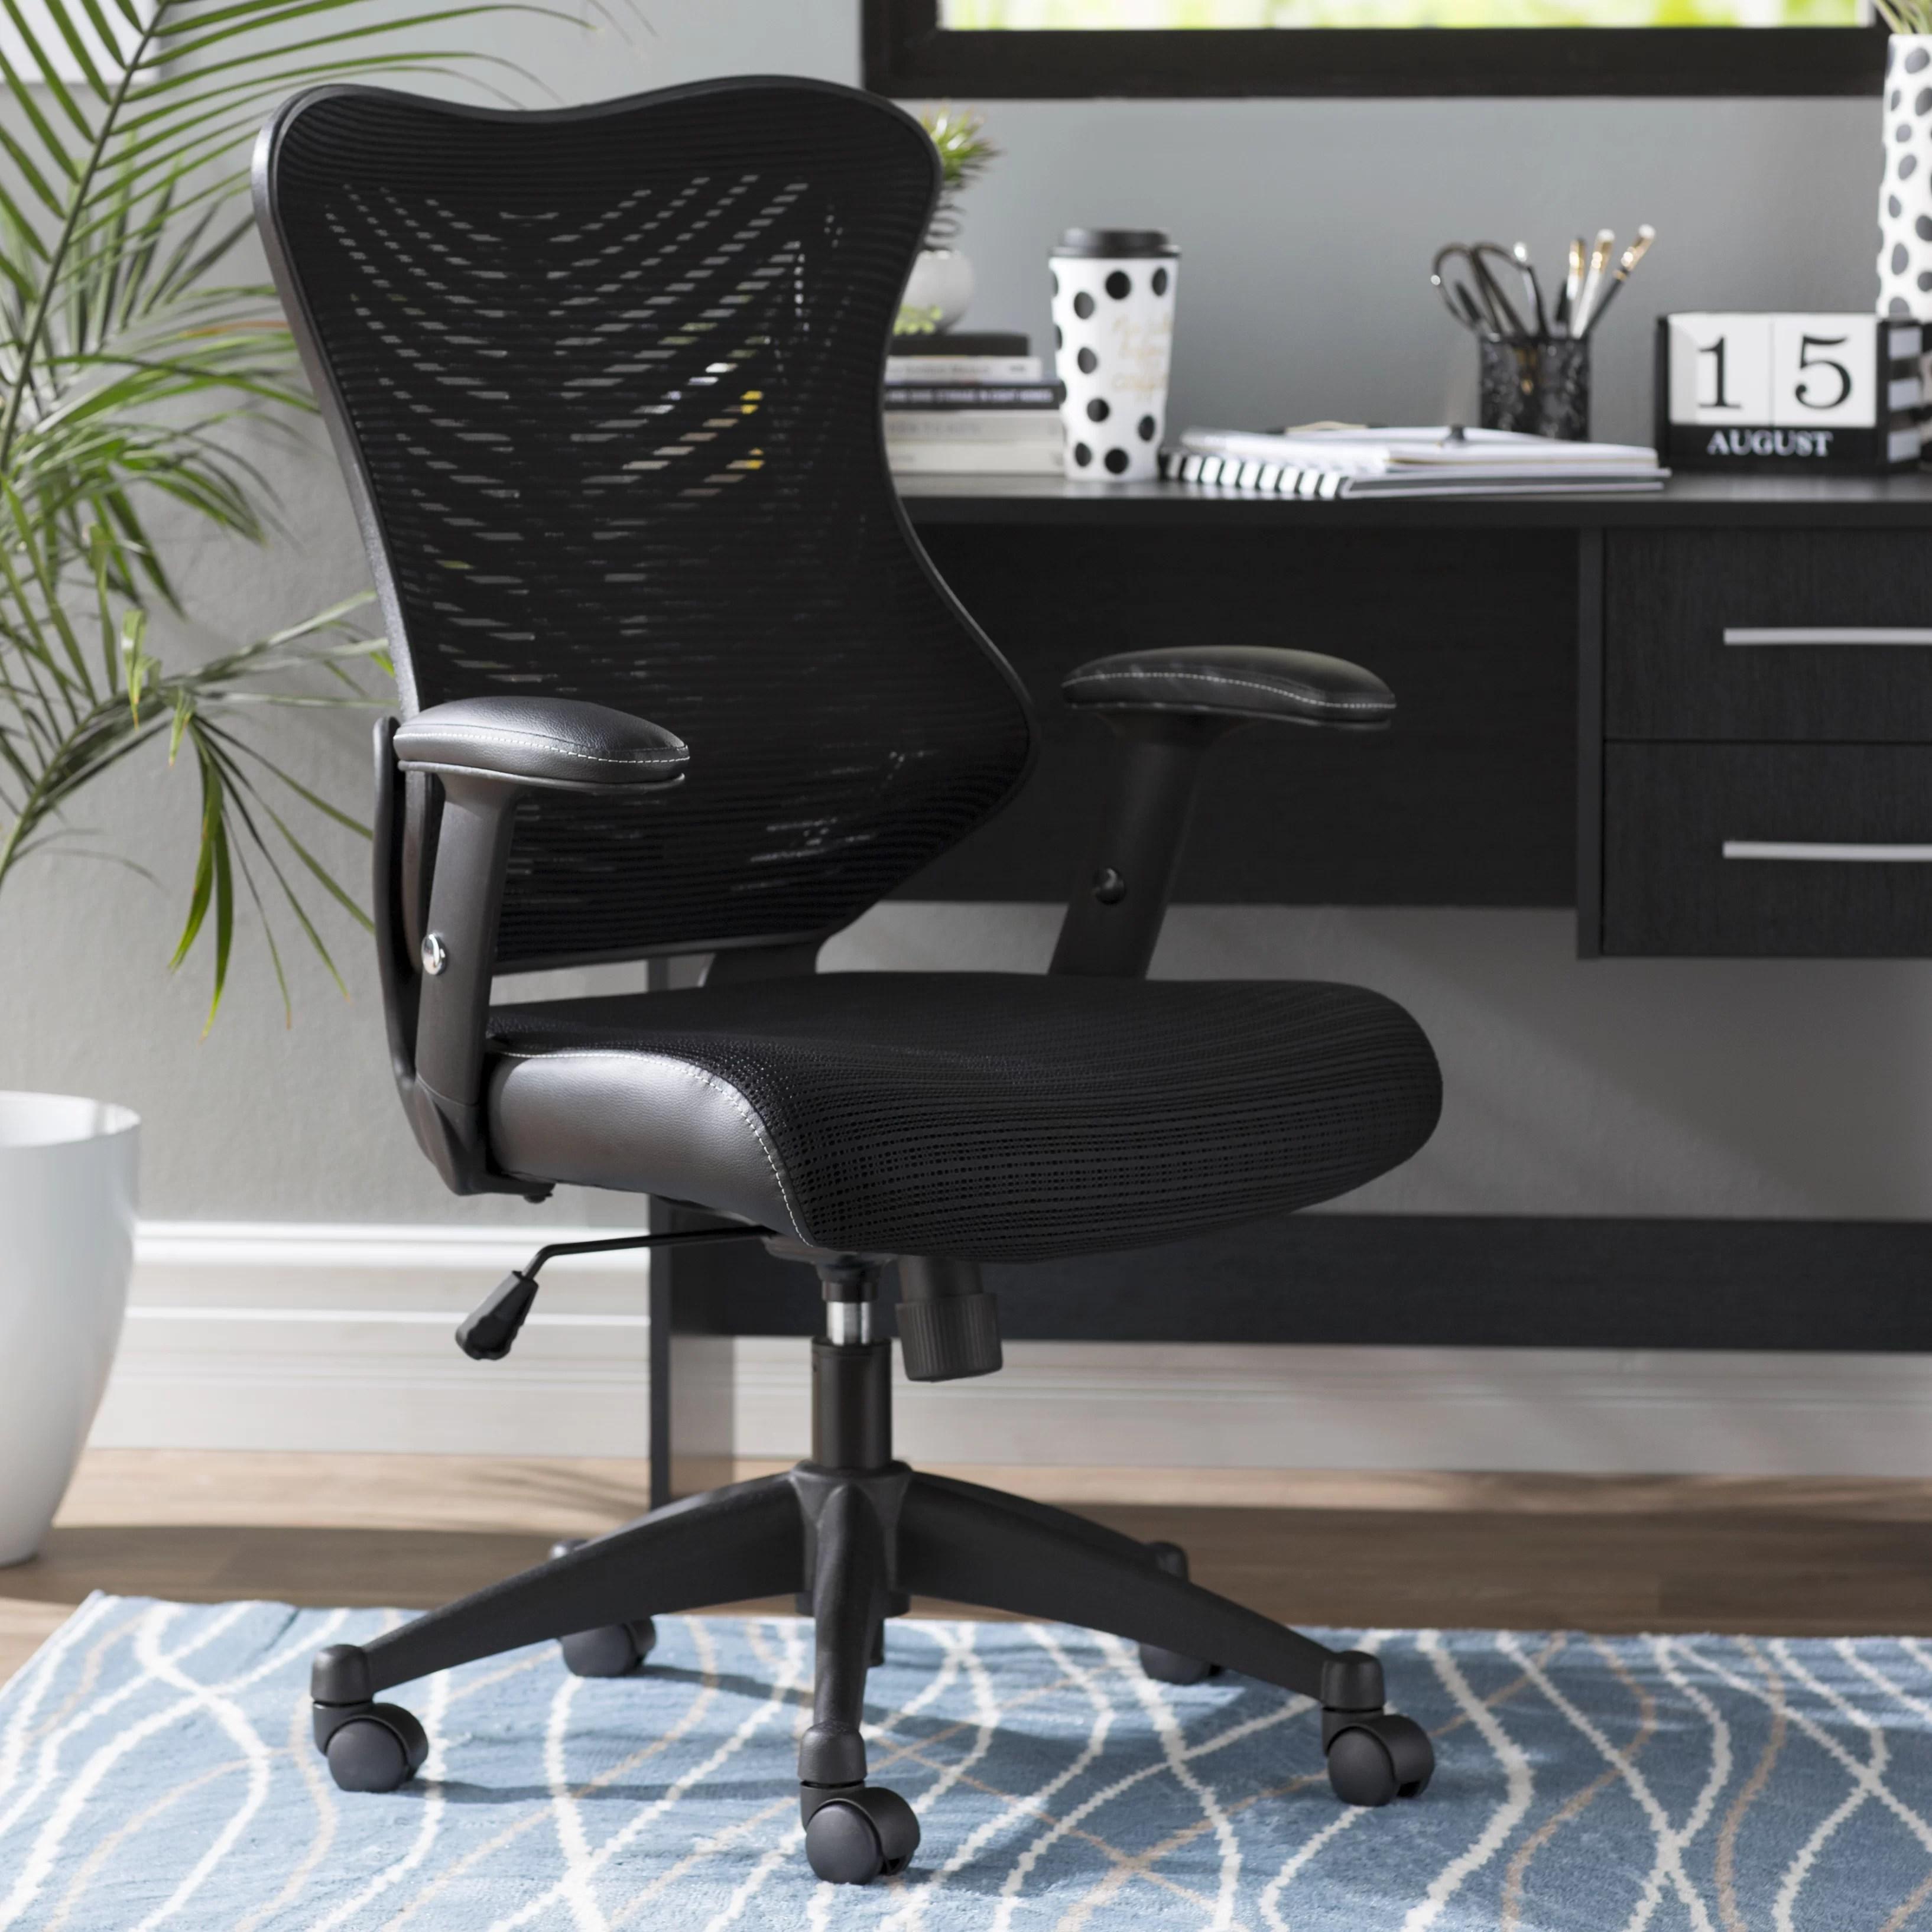 ergonomic chair joe rogan staples mesh desk w the truly